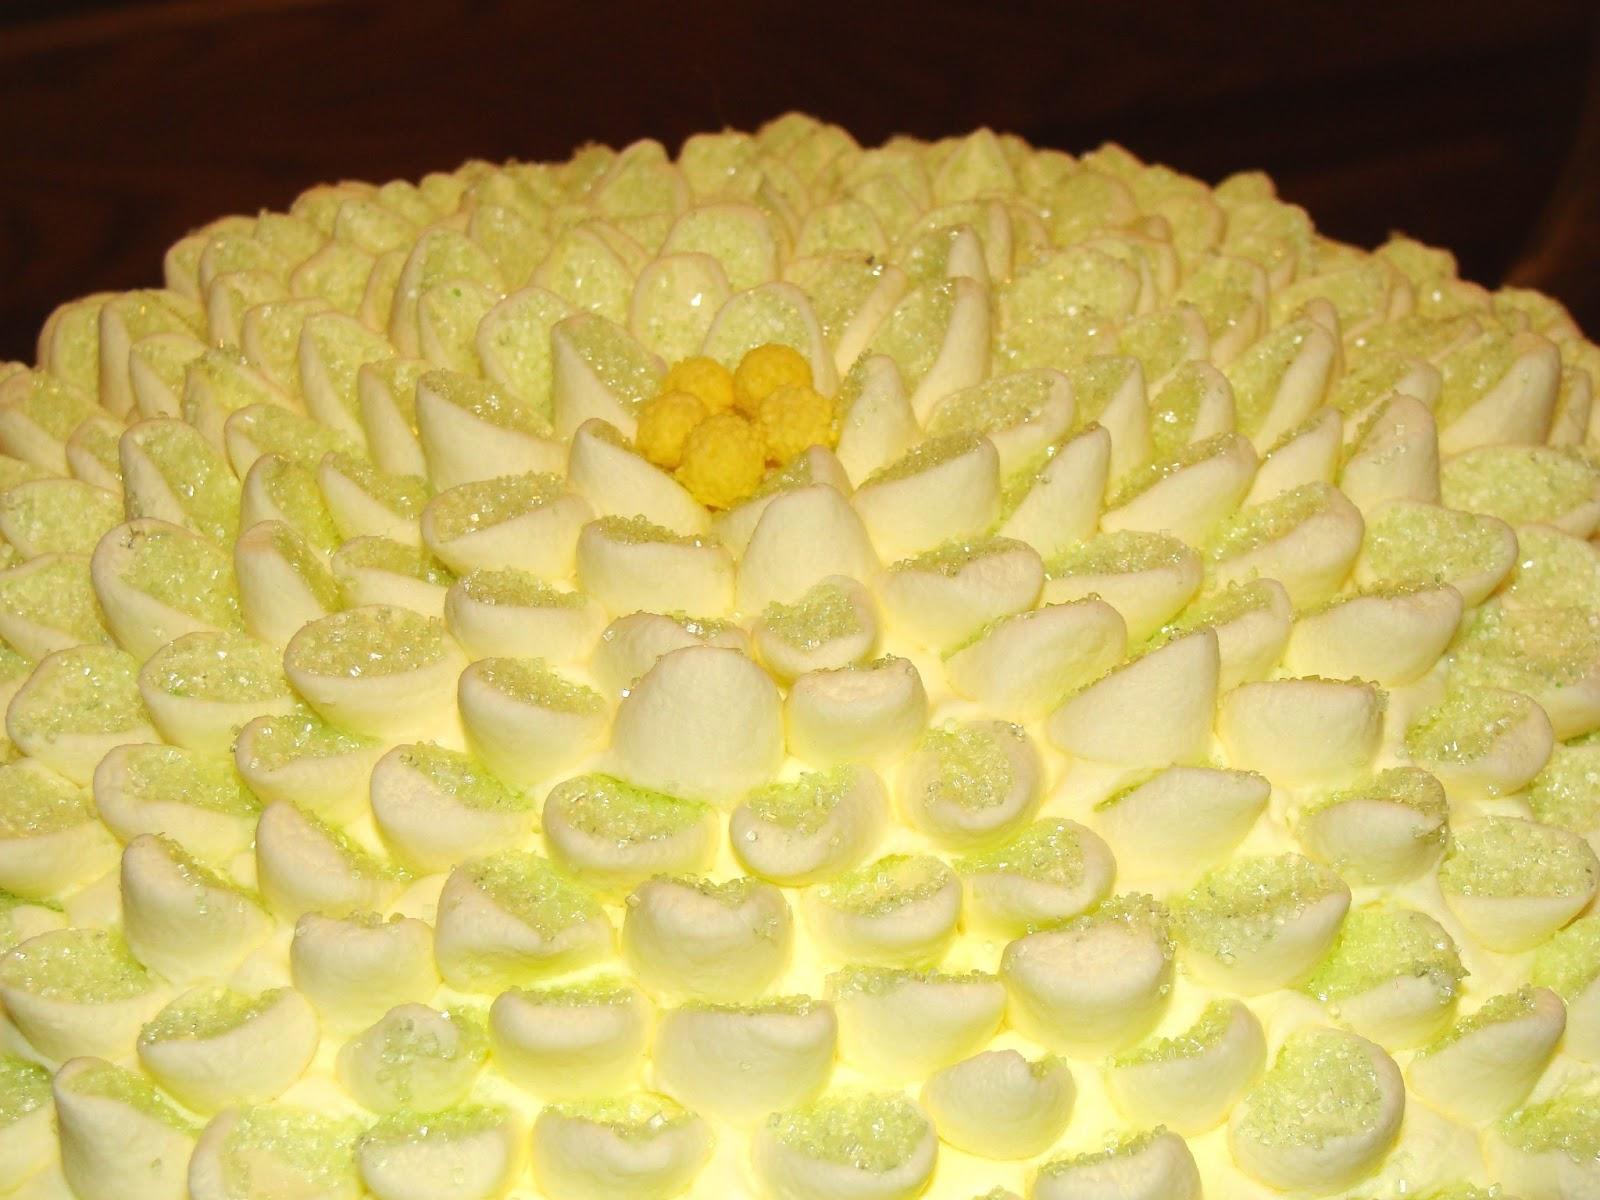 Cake Decorating Marshmallow Flowers : Haybee Baby: Marshmallow Flower Cake